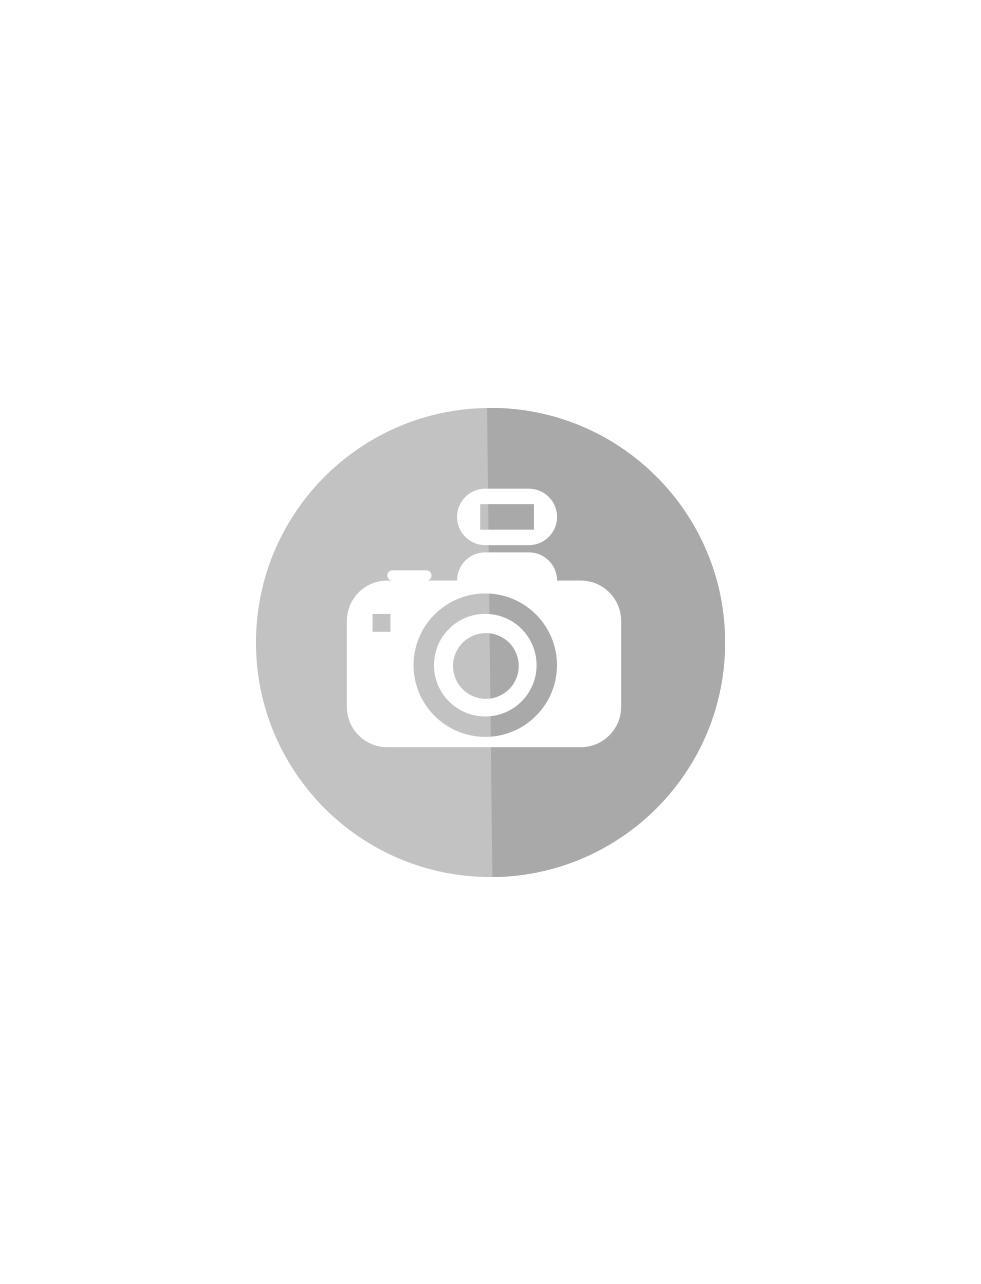 category_image_Stadtreinigung